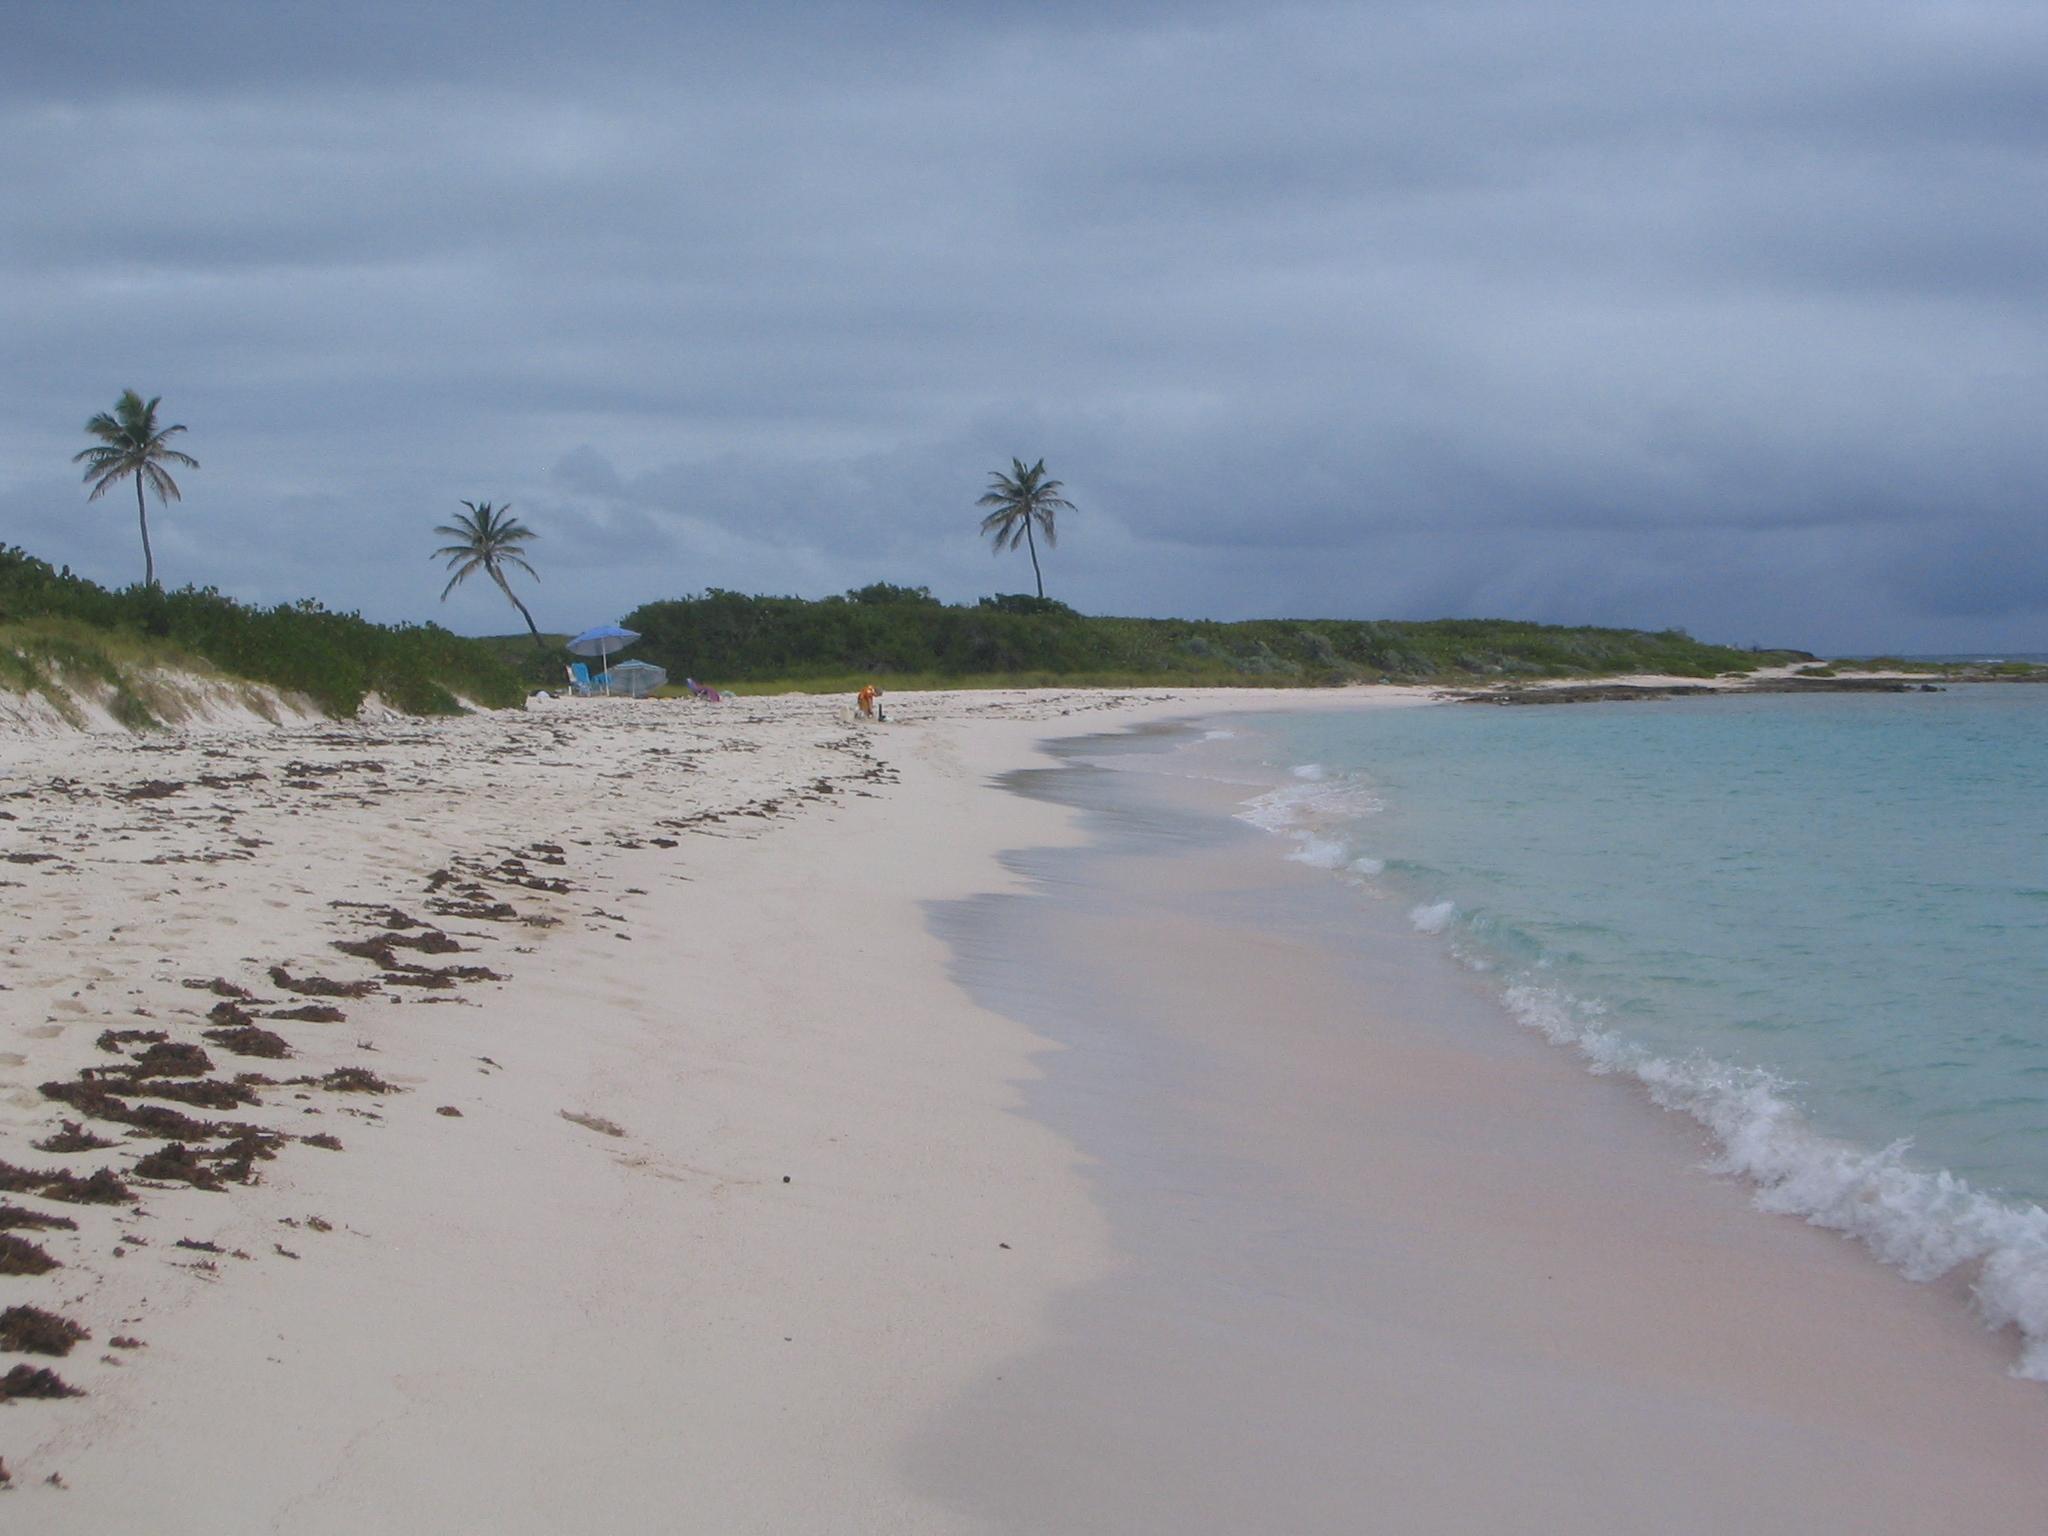 Solitude at Junk's Hole Beach